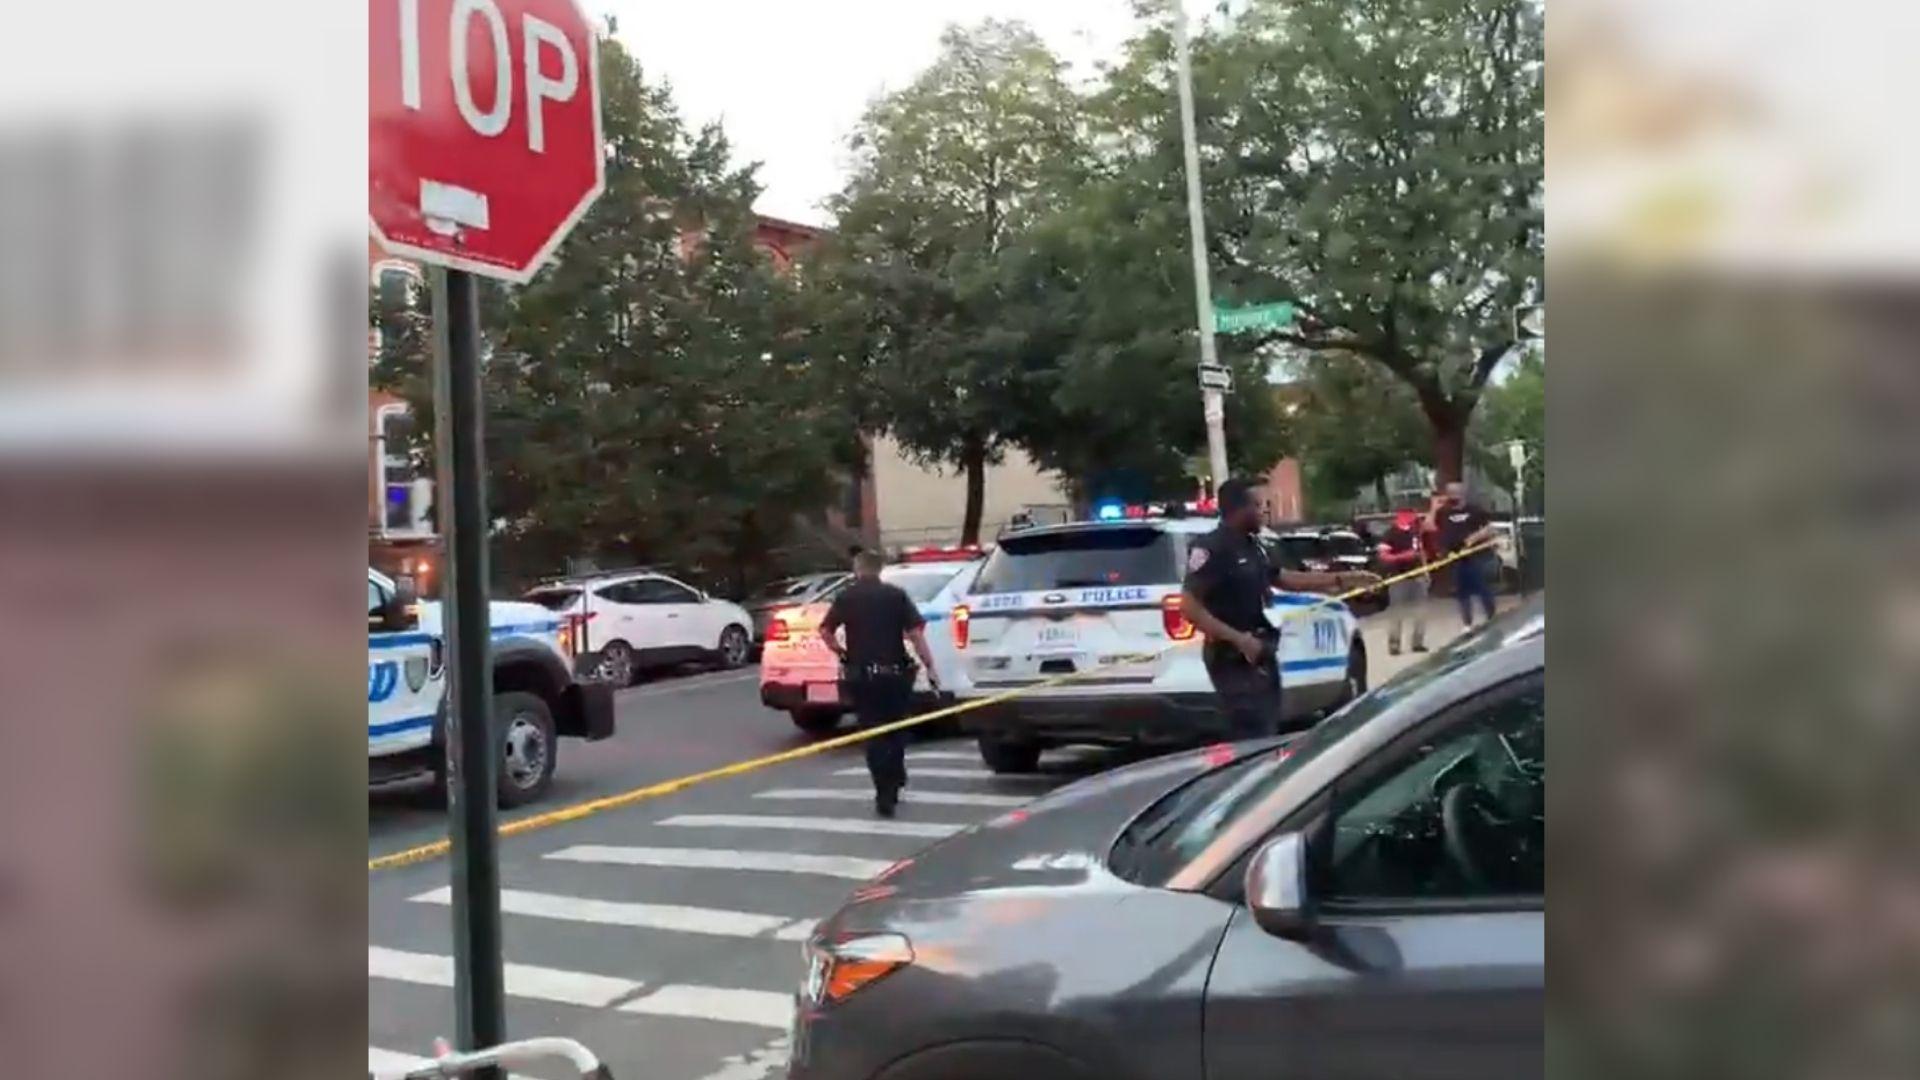 16-year-old fatally shot in Bedford-Stuyvesant, Brooklyn